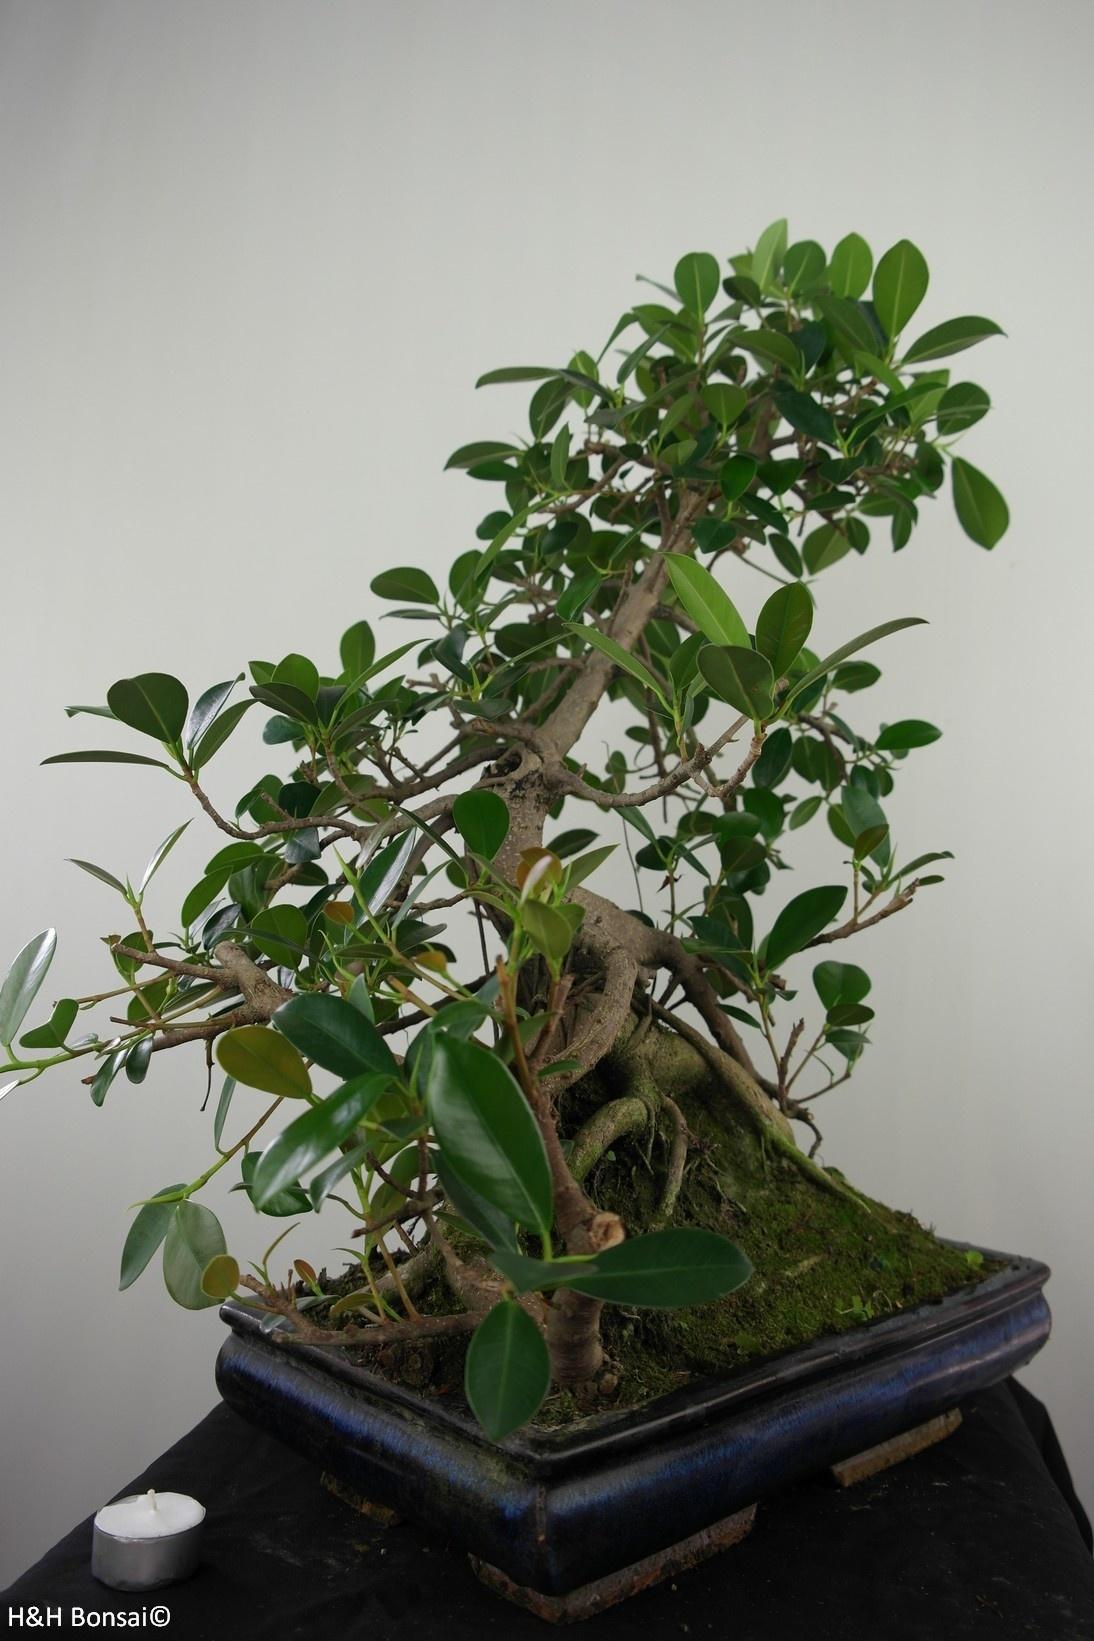 Bonsai Fig Tree, Ficus microcarpa panda, no. 7683